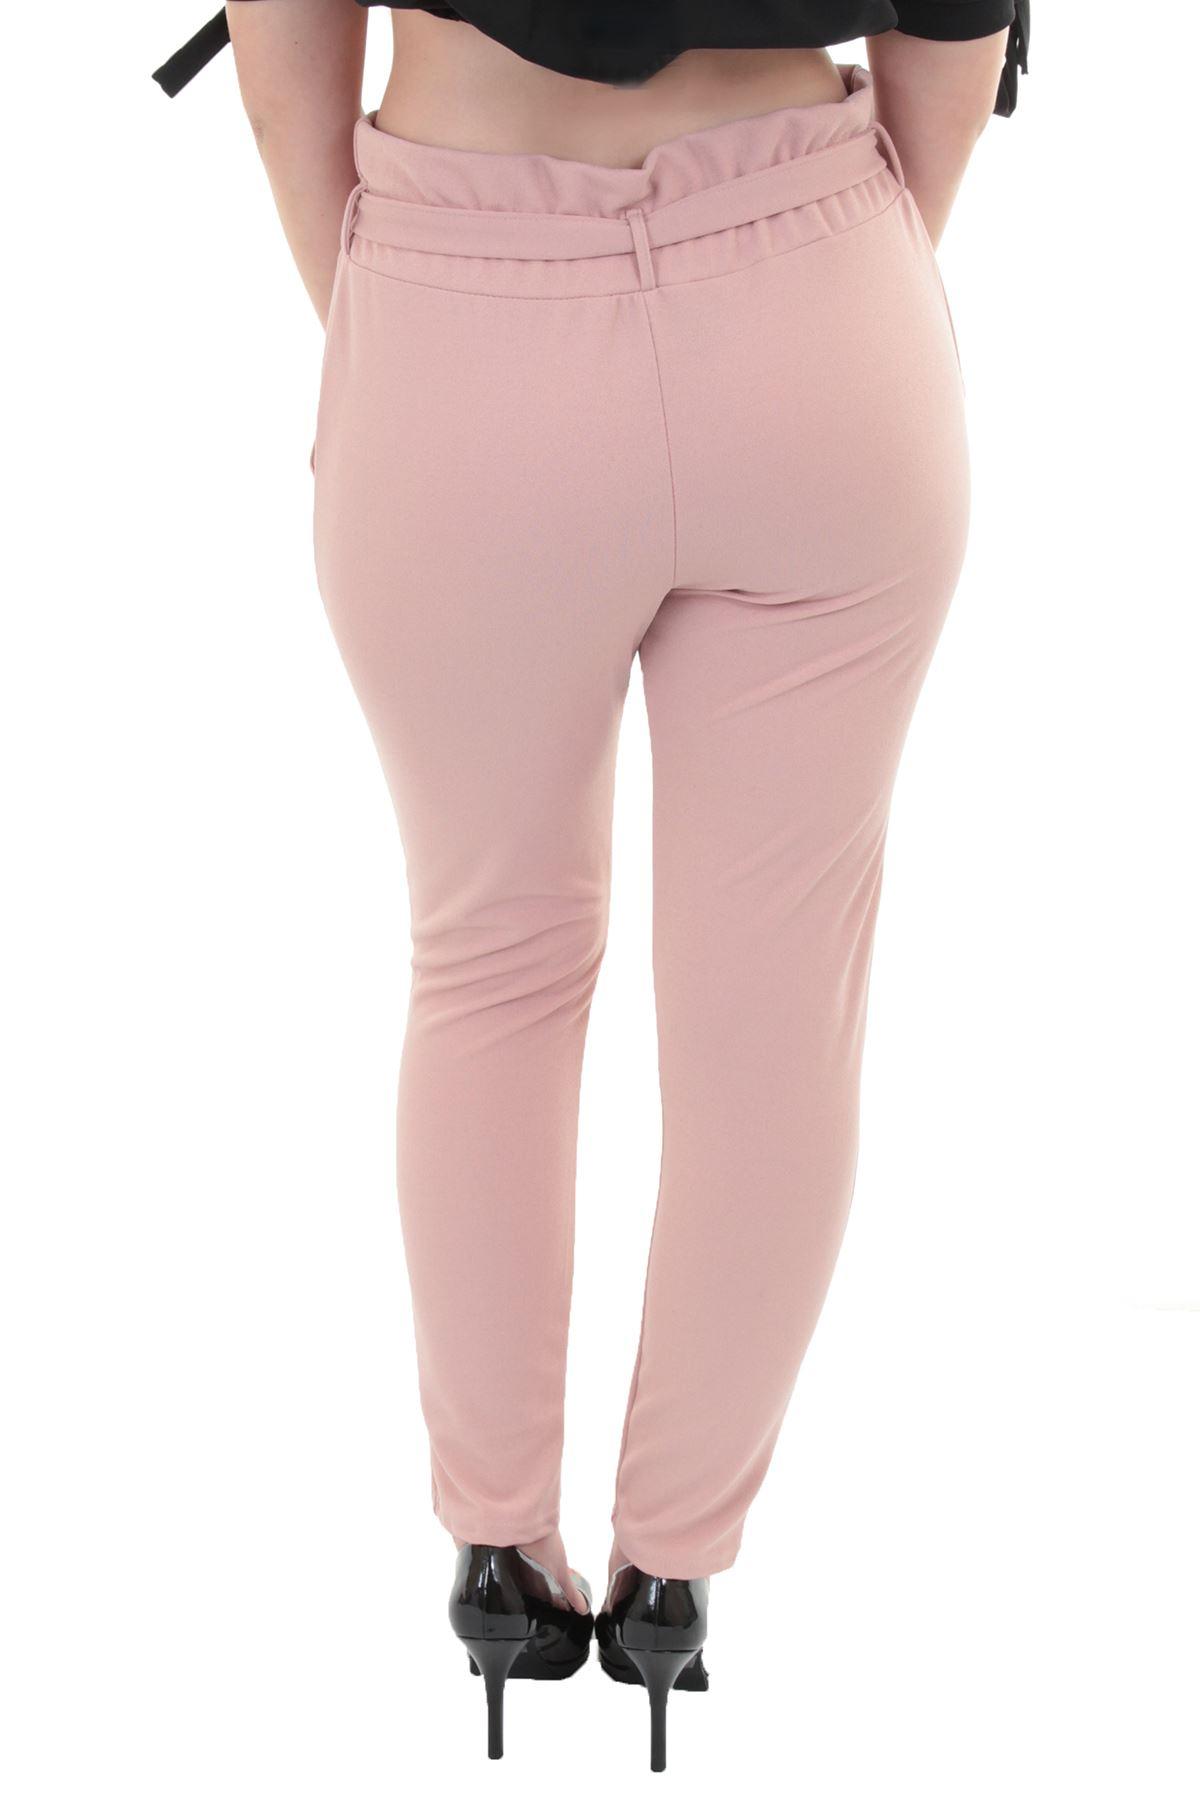 Womens Elasticated High Waist Ali Baba Plain Smart Textured Crepe Trousers